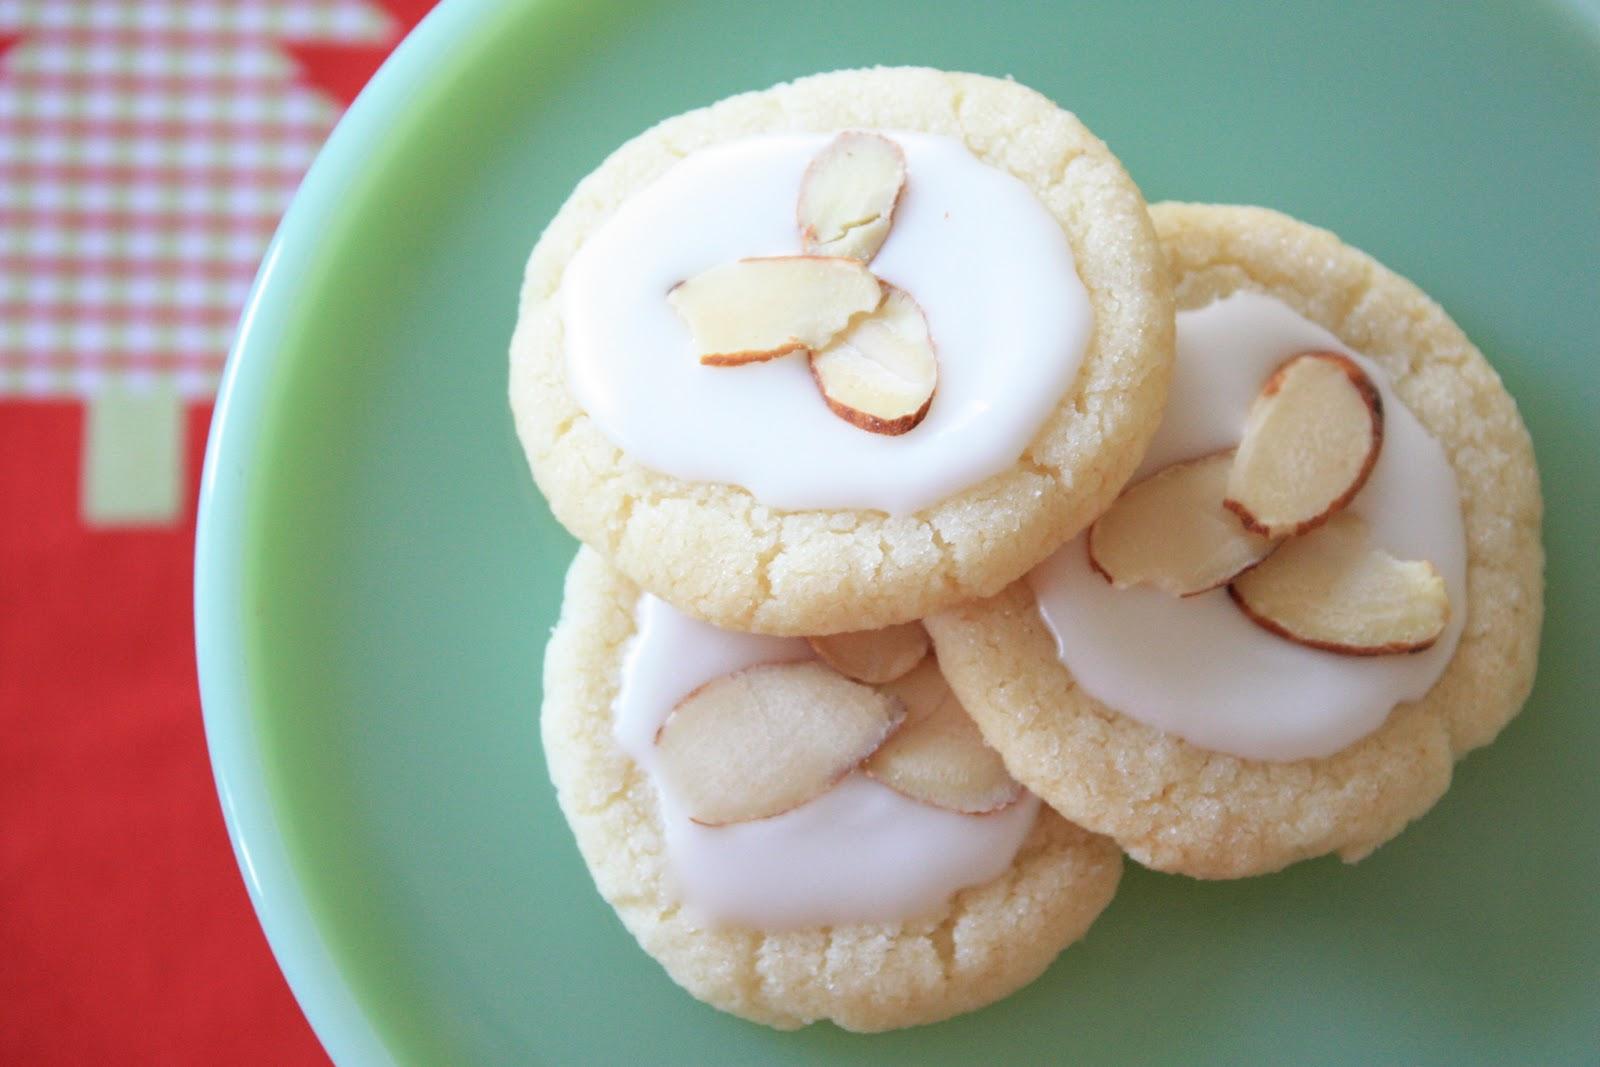 Munchkin Munchies: Almond Glazed Sugar Cookies